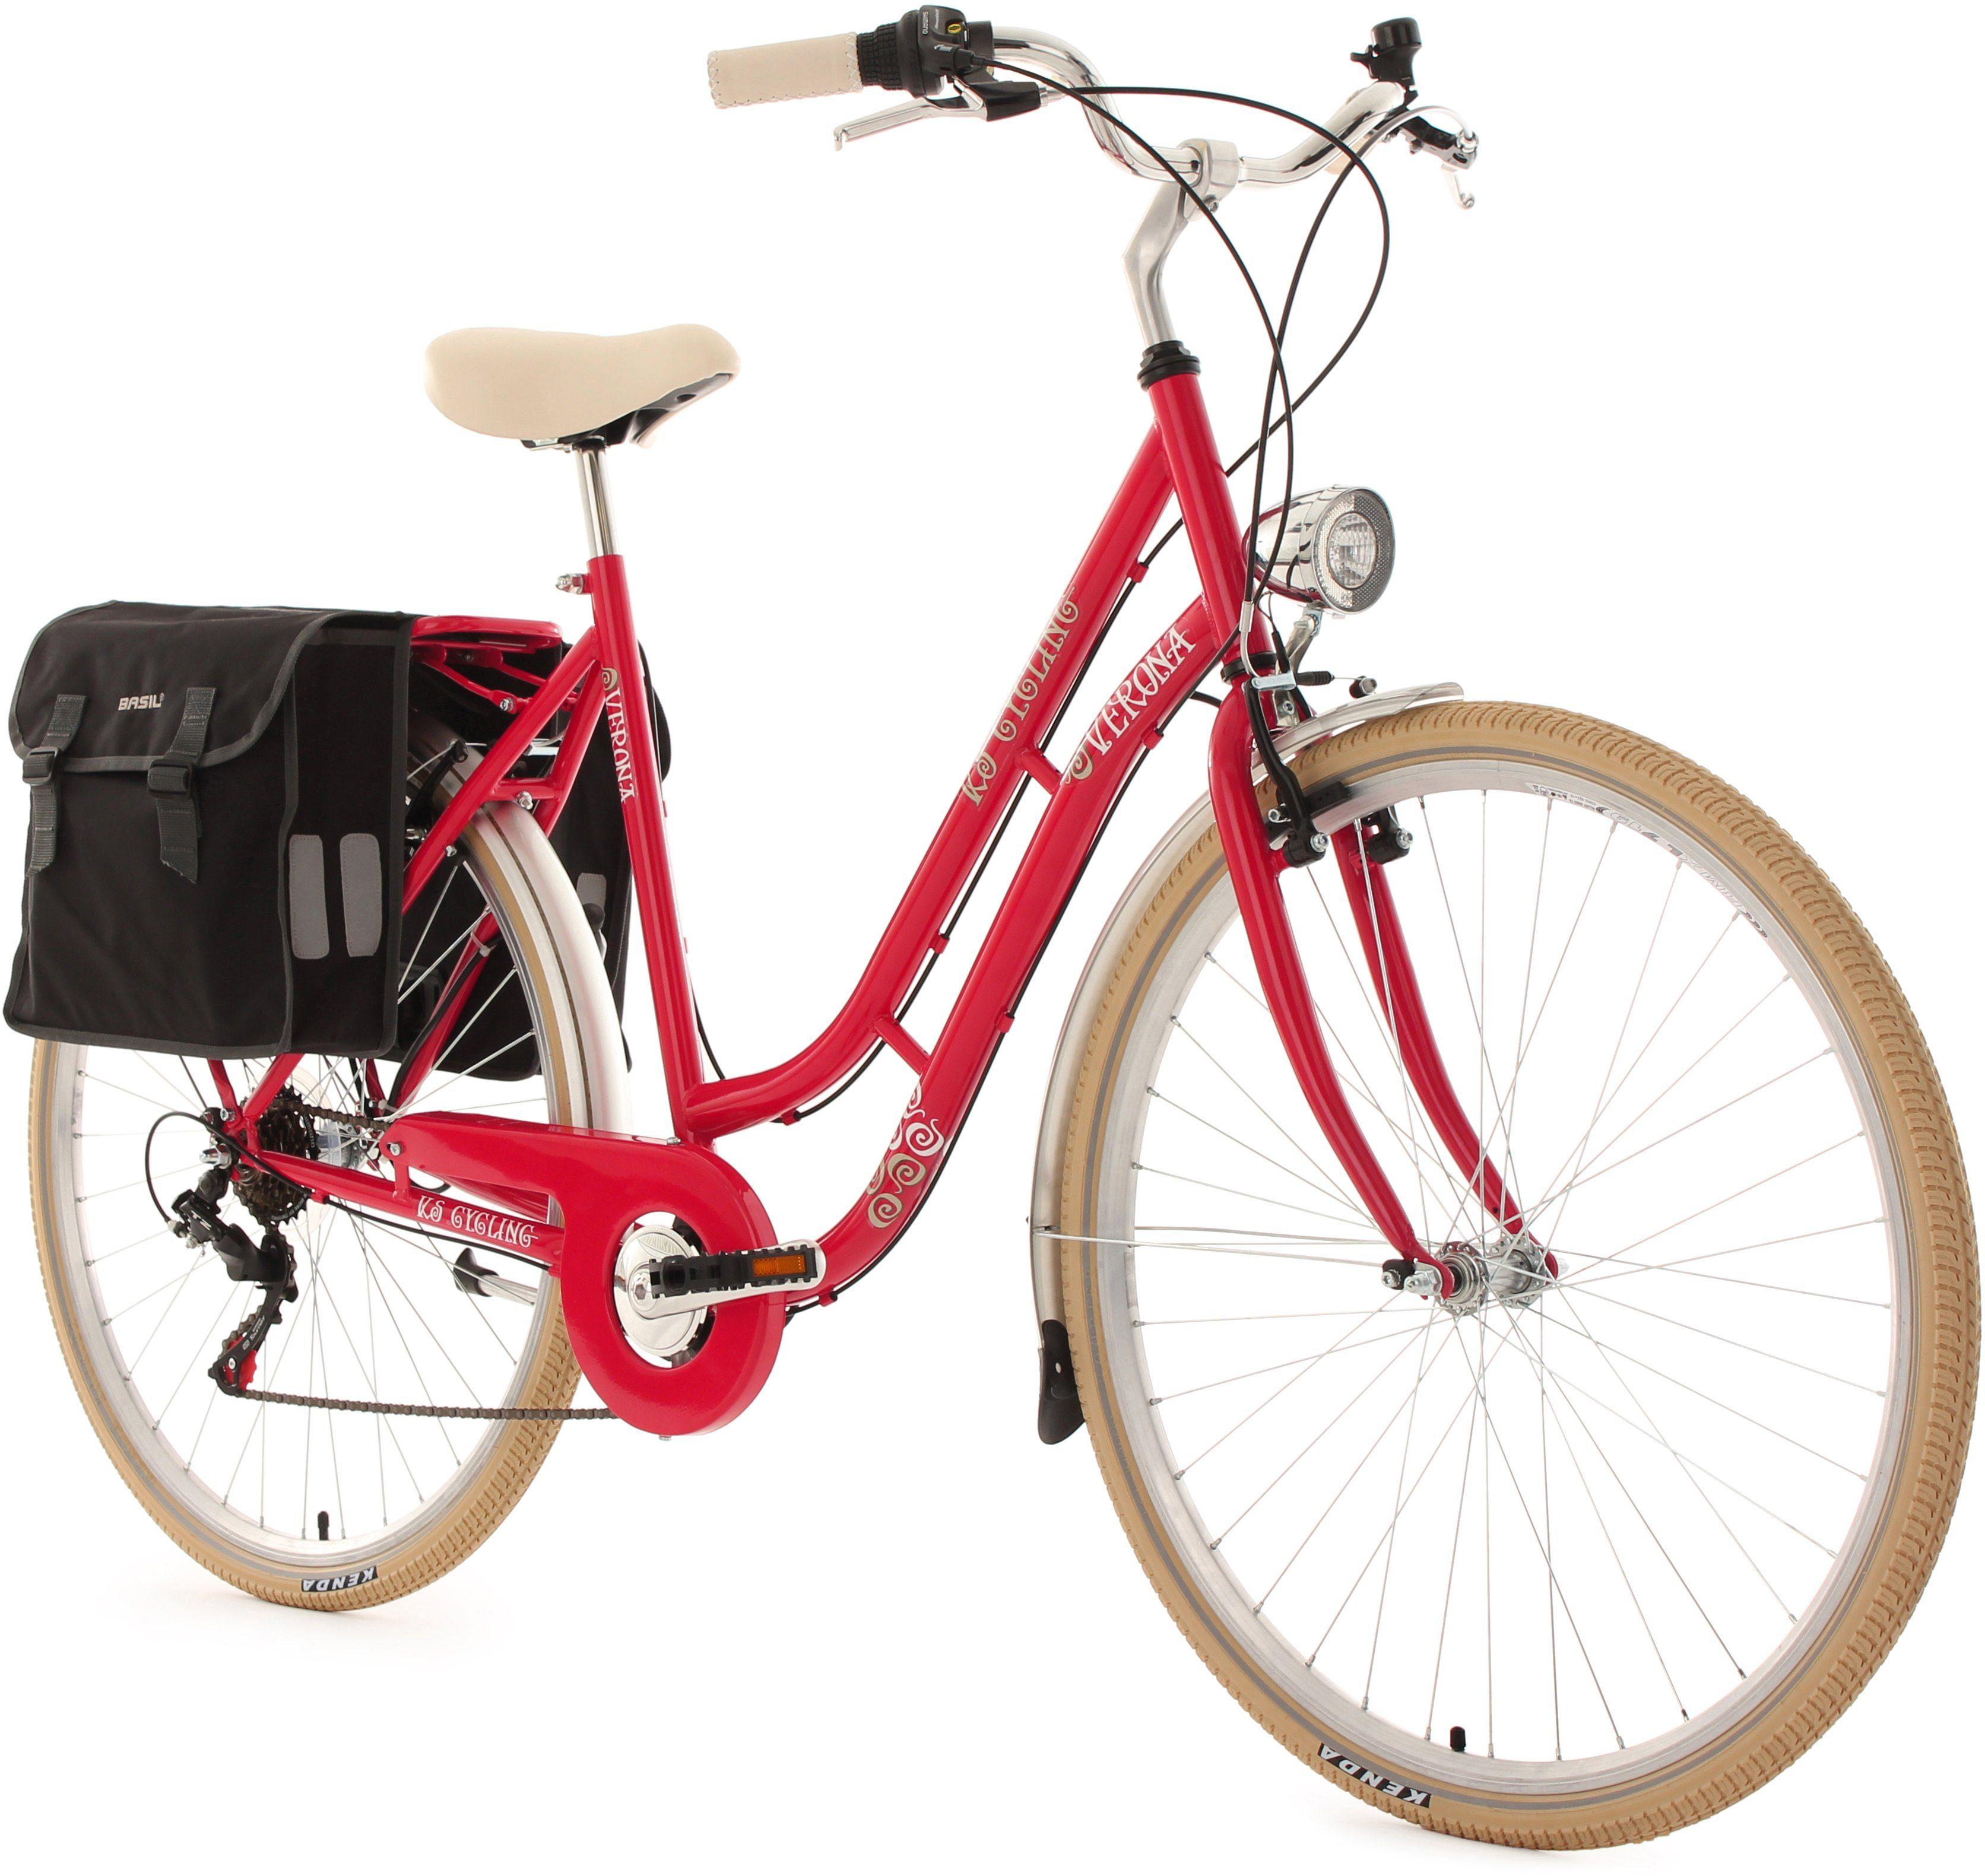 KS Cycling Damen-Cityrad, 28 Zoll, 6 Gang Shimano Tourney inkl. Doppelpacktasche, »Verona«